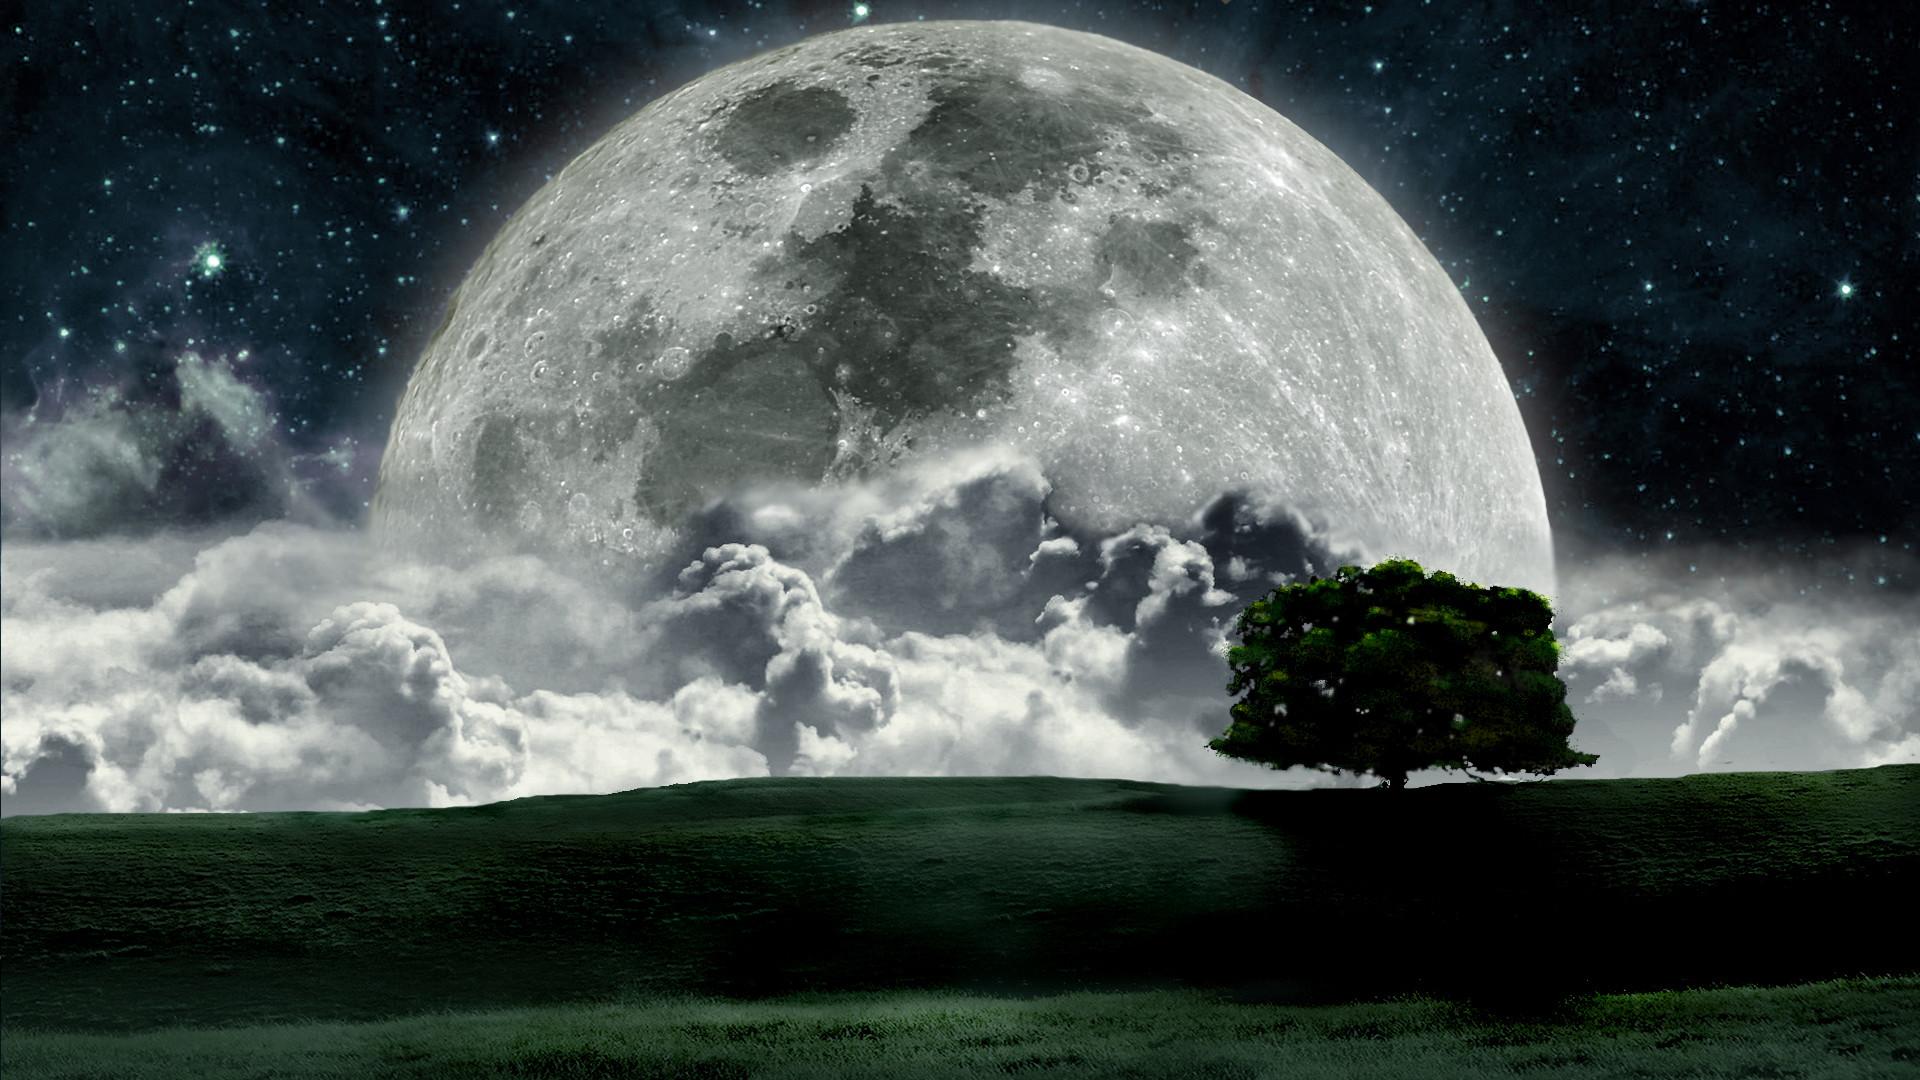 moon-wallpaper-landscape-dream-wallpapers.jpg